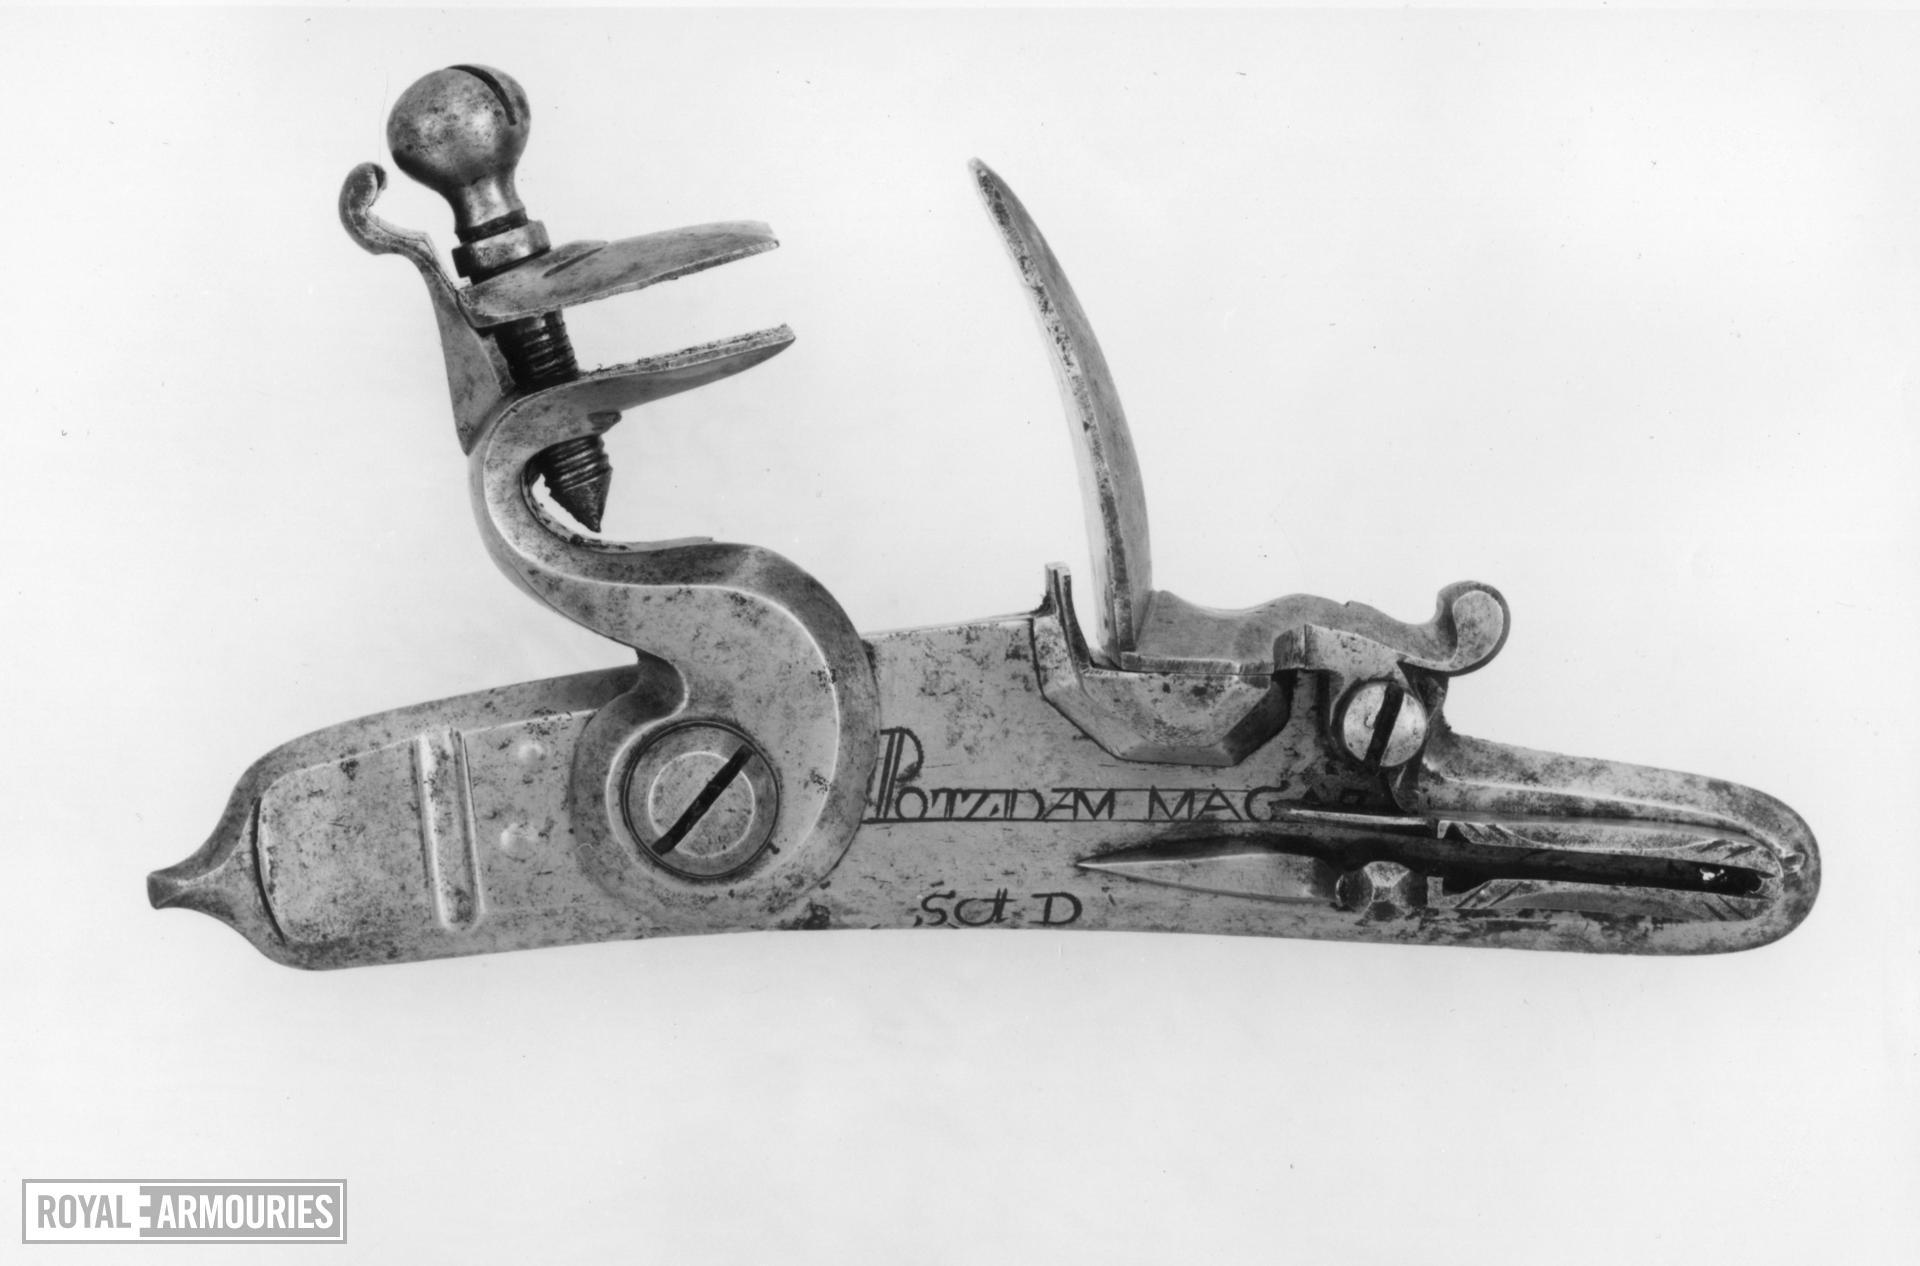 Detached flintlock lock - By Potzdam armoury